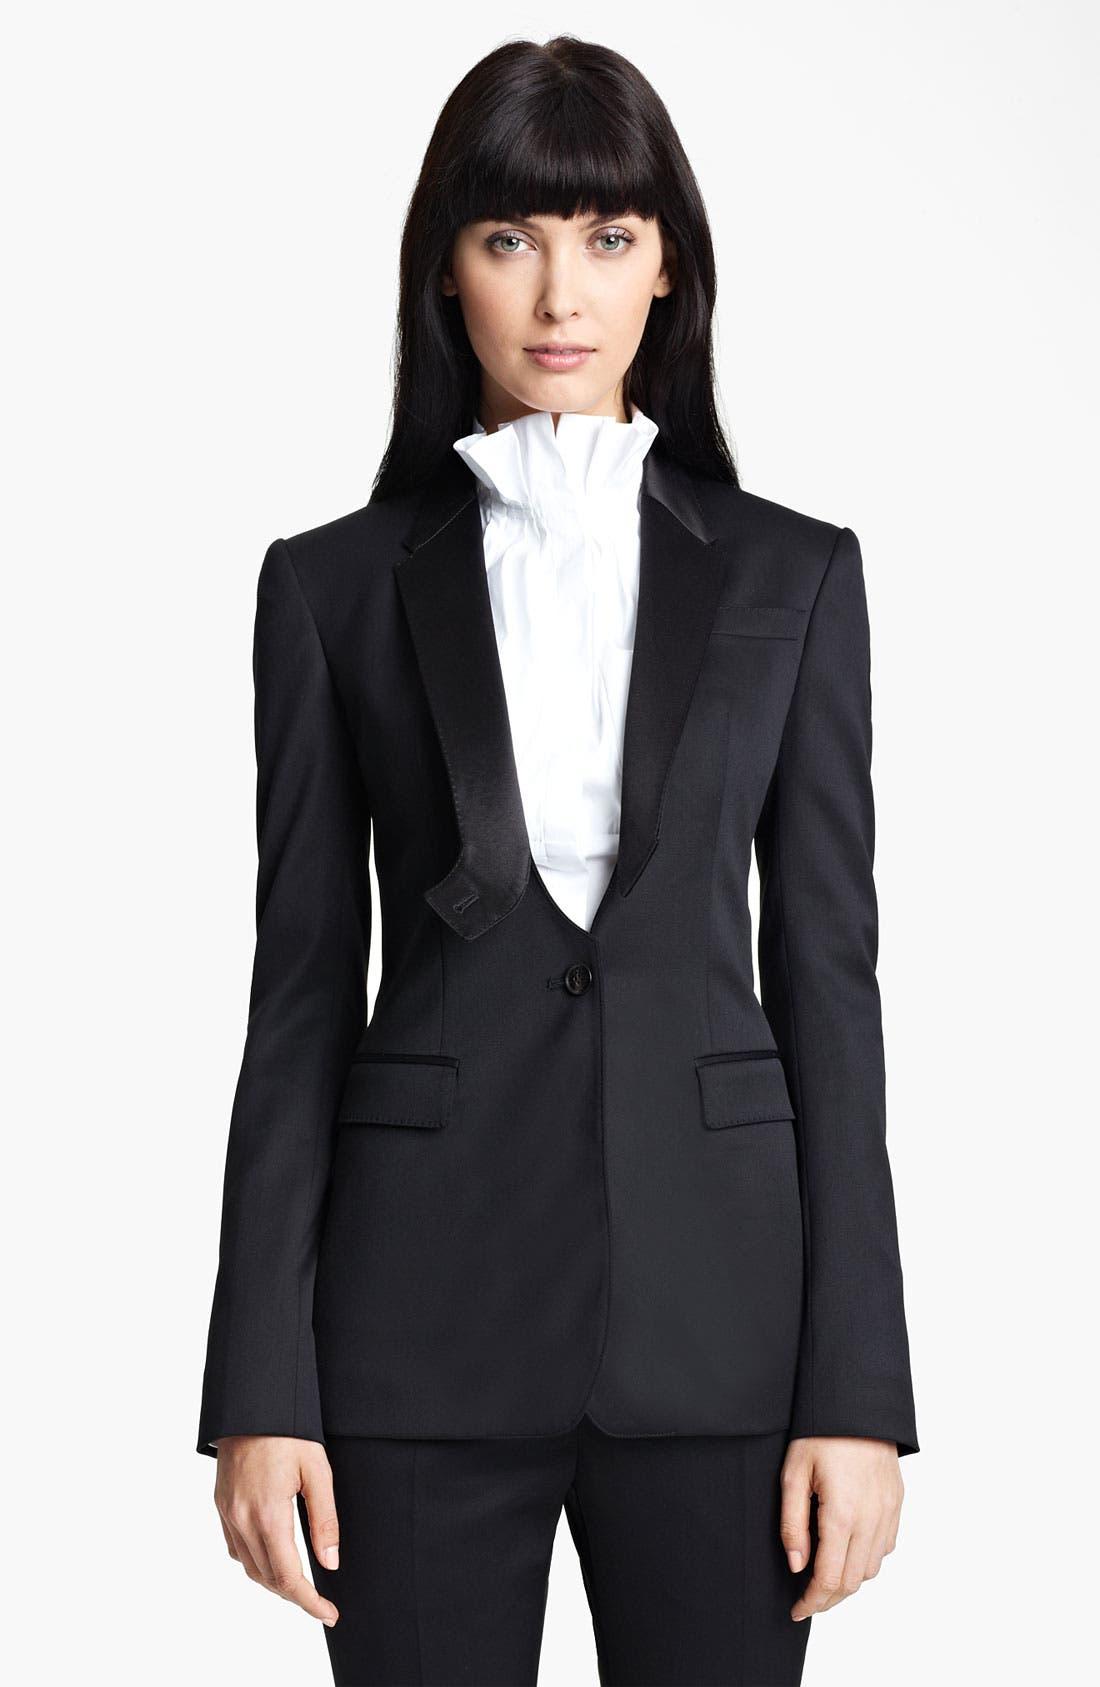 Alternate Image 1 Selected - Burberry Prorsum Stretch Wool Tuxedo Jacket